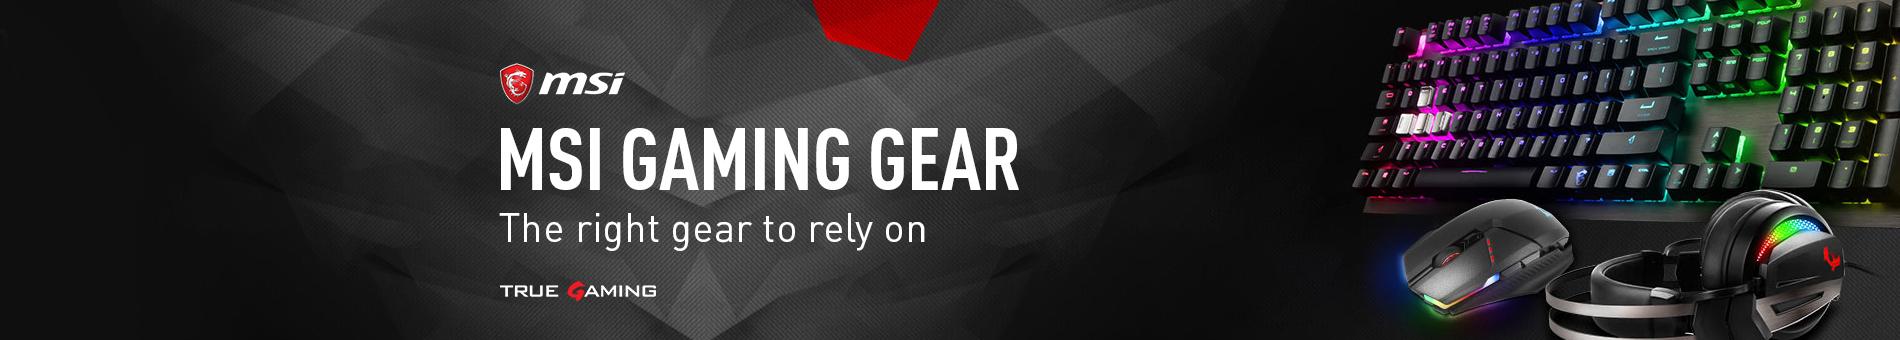 Msi Gaming Accessories General  Banner 01